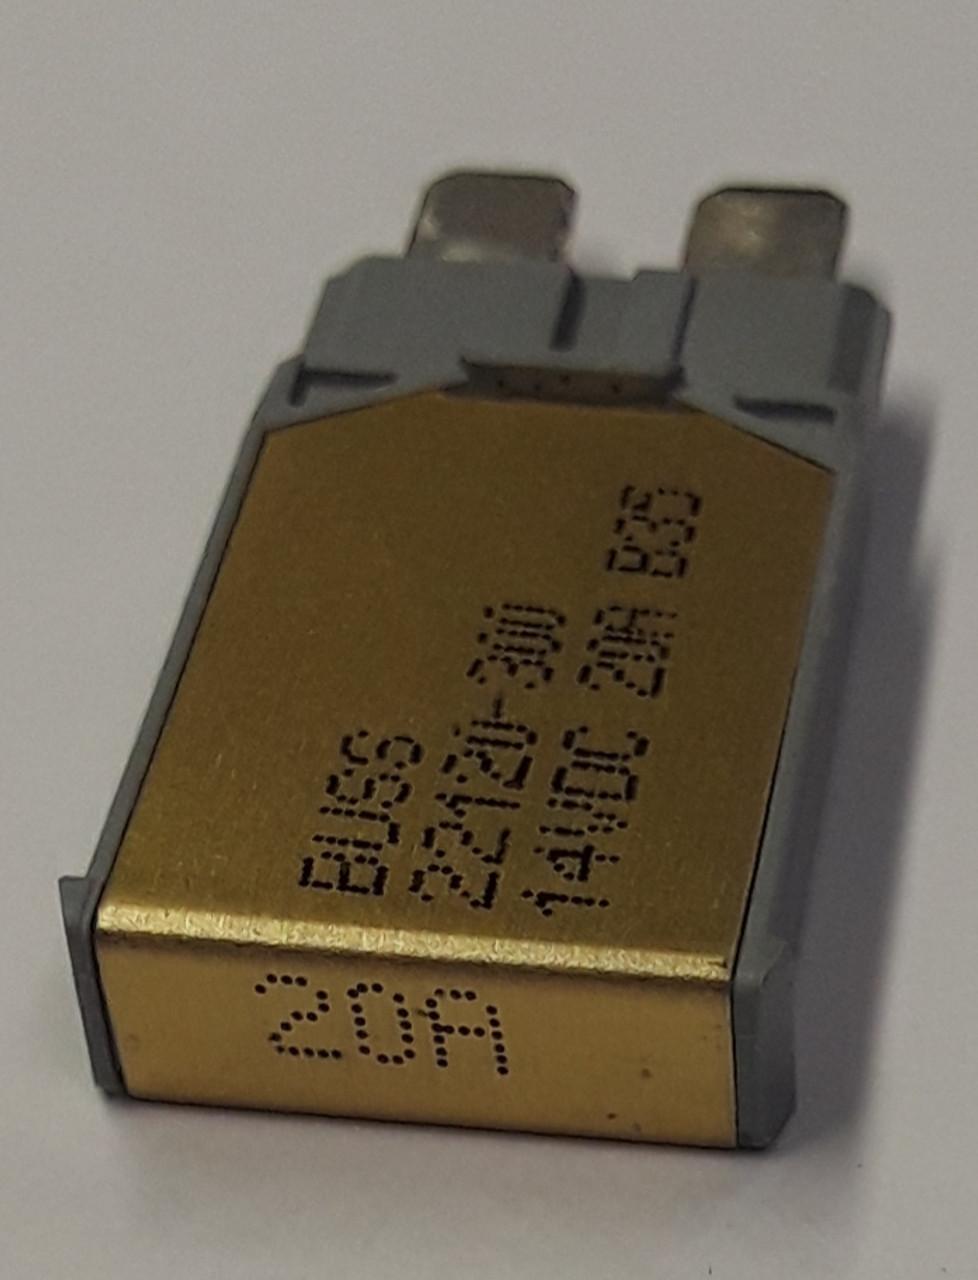 22120 300 cooper bussmann 20 amp mini circuit breaker with atc 22120 300 cooper bussmann type [ 978 x 1280 Pixel ]